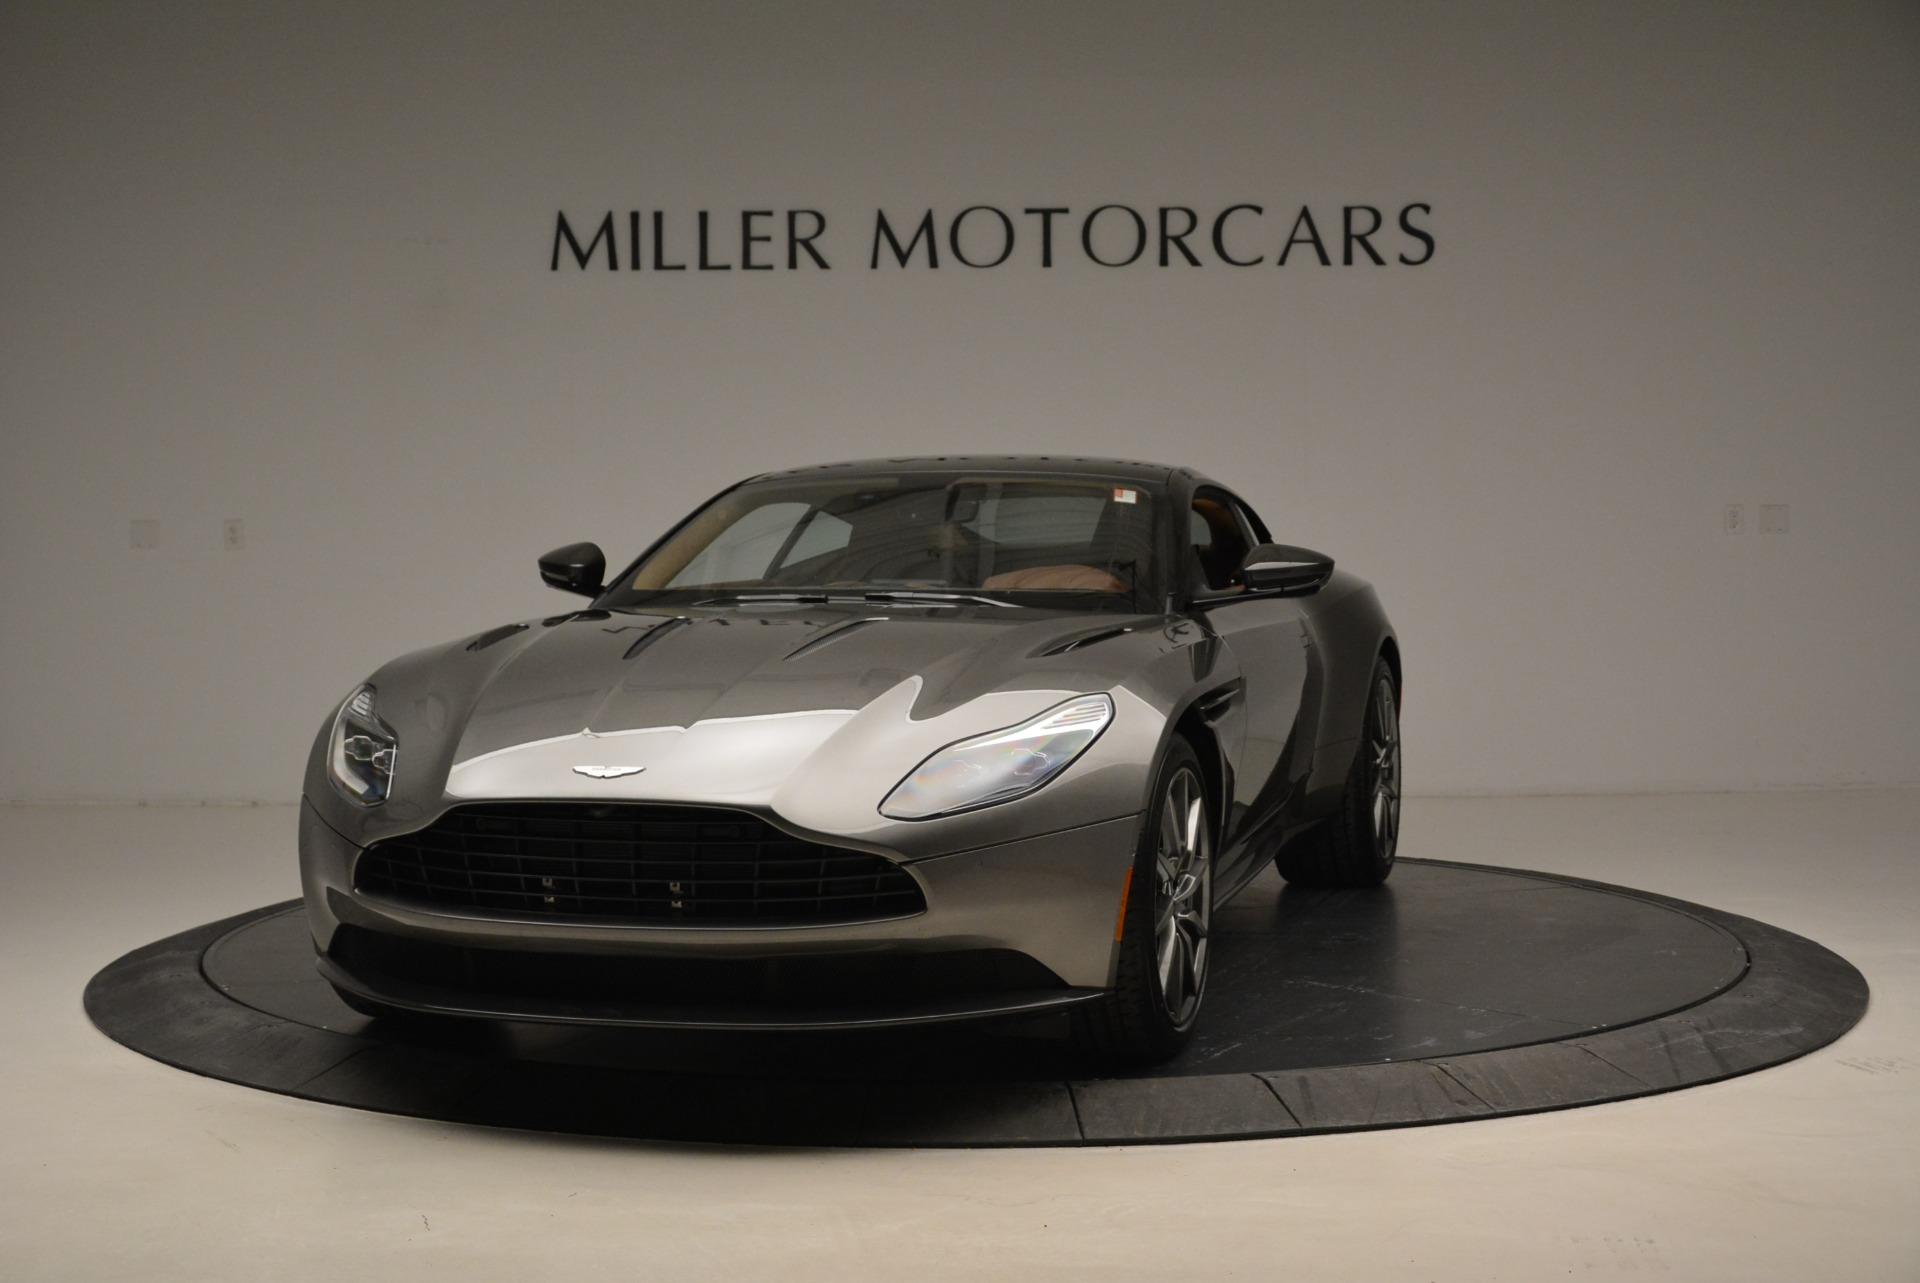 Used 2018 Aston Martin DB11 V12 for sale $169,990 at Bugatti of Greenwich in Greenwich CT 06830 1